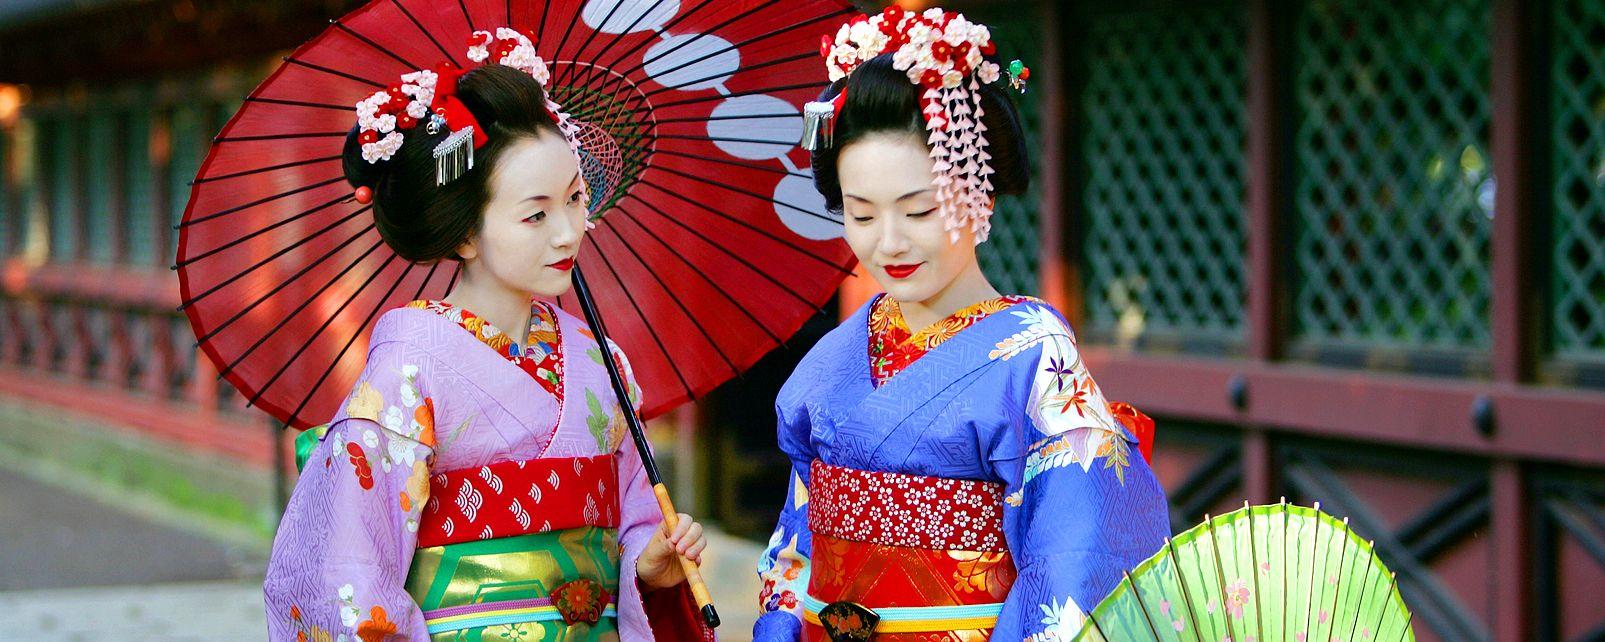 Les traditions, asie, japon, geisha, tradition, femme, art, artiste